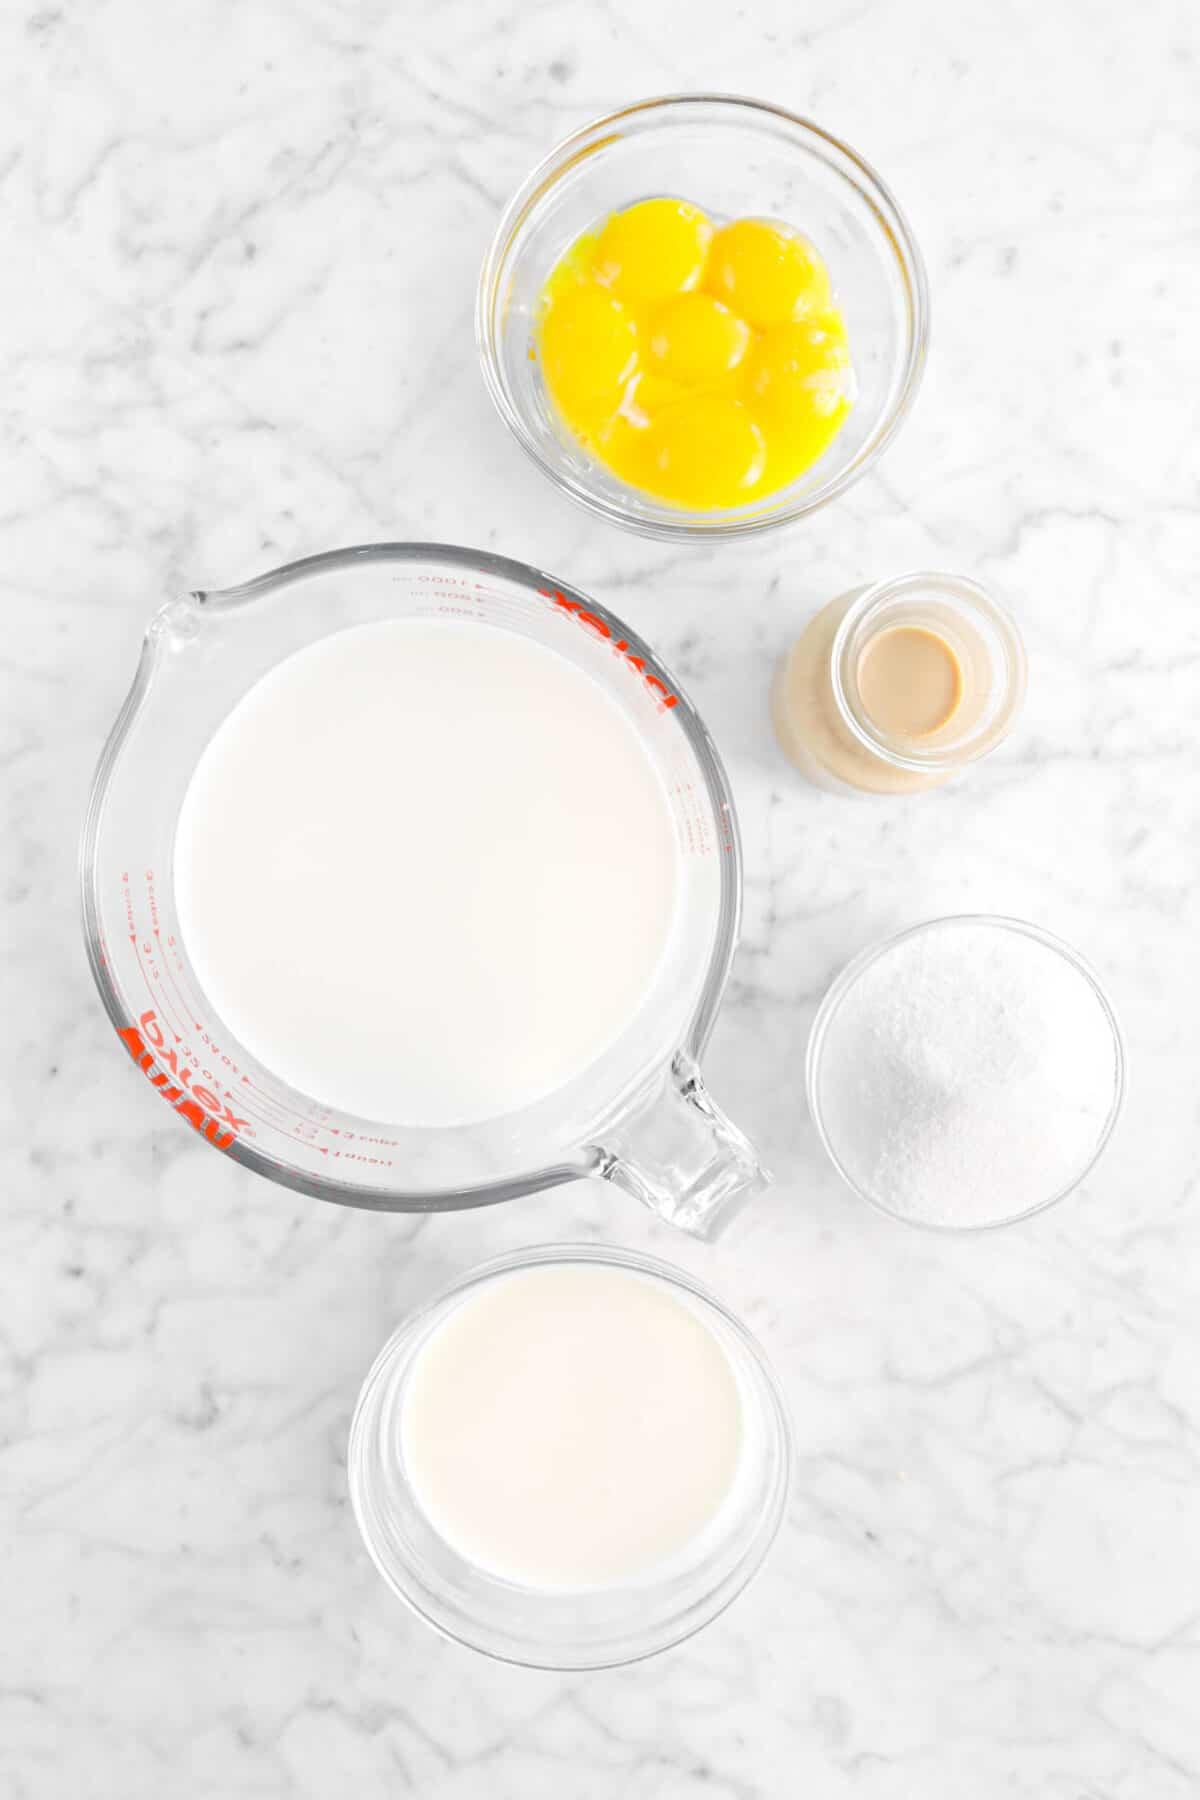 egg yolks, irish cream, sugar, heavy cream, and milk in bowls on marble counter